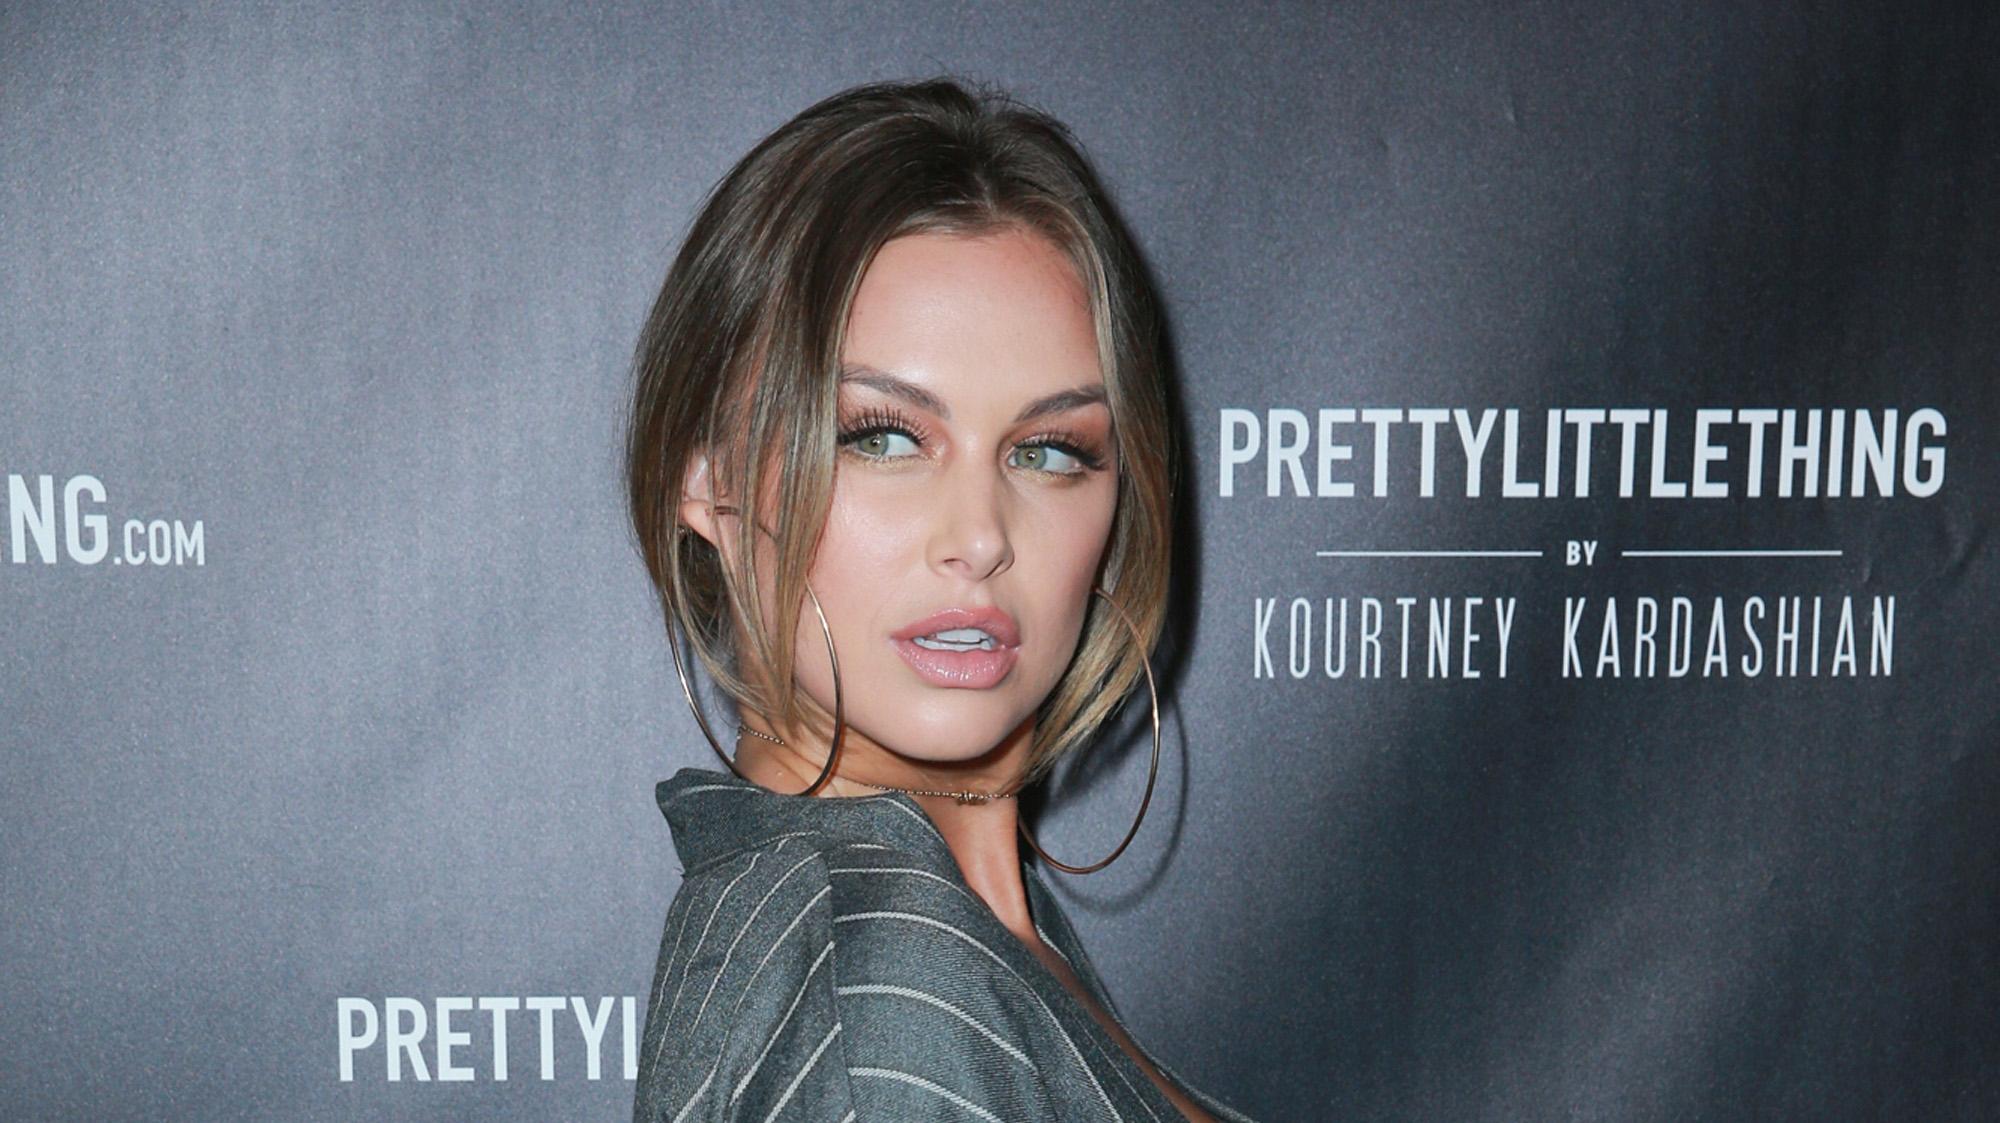 Ugly Girl Tits